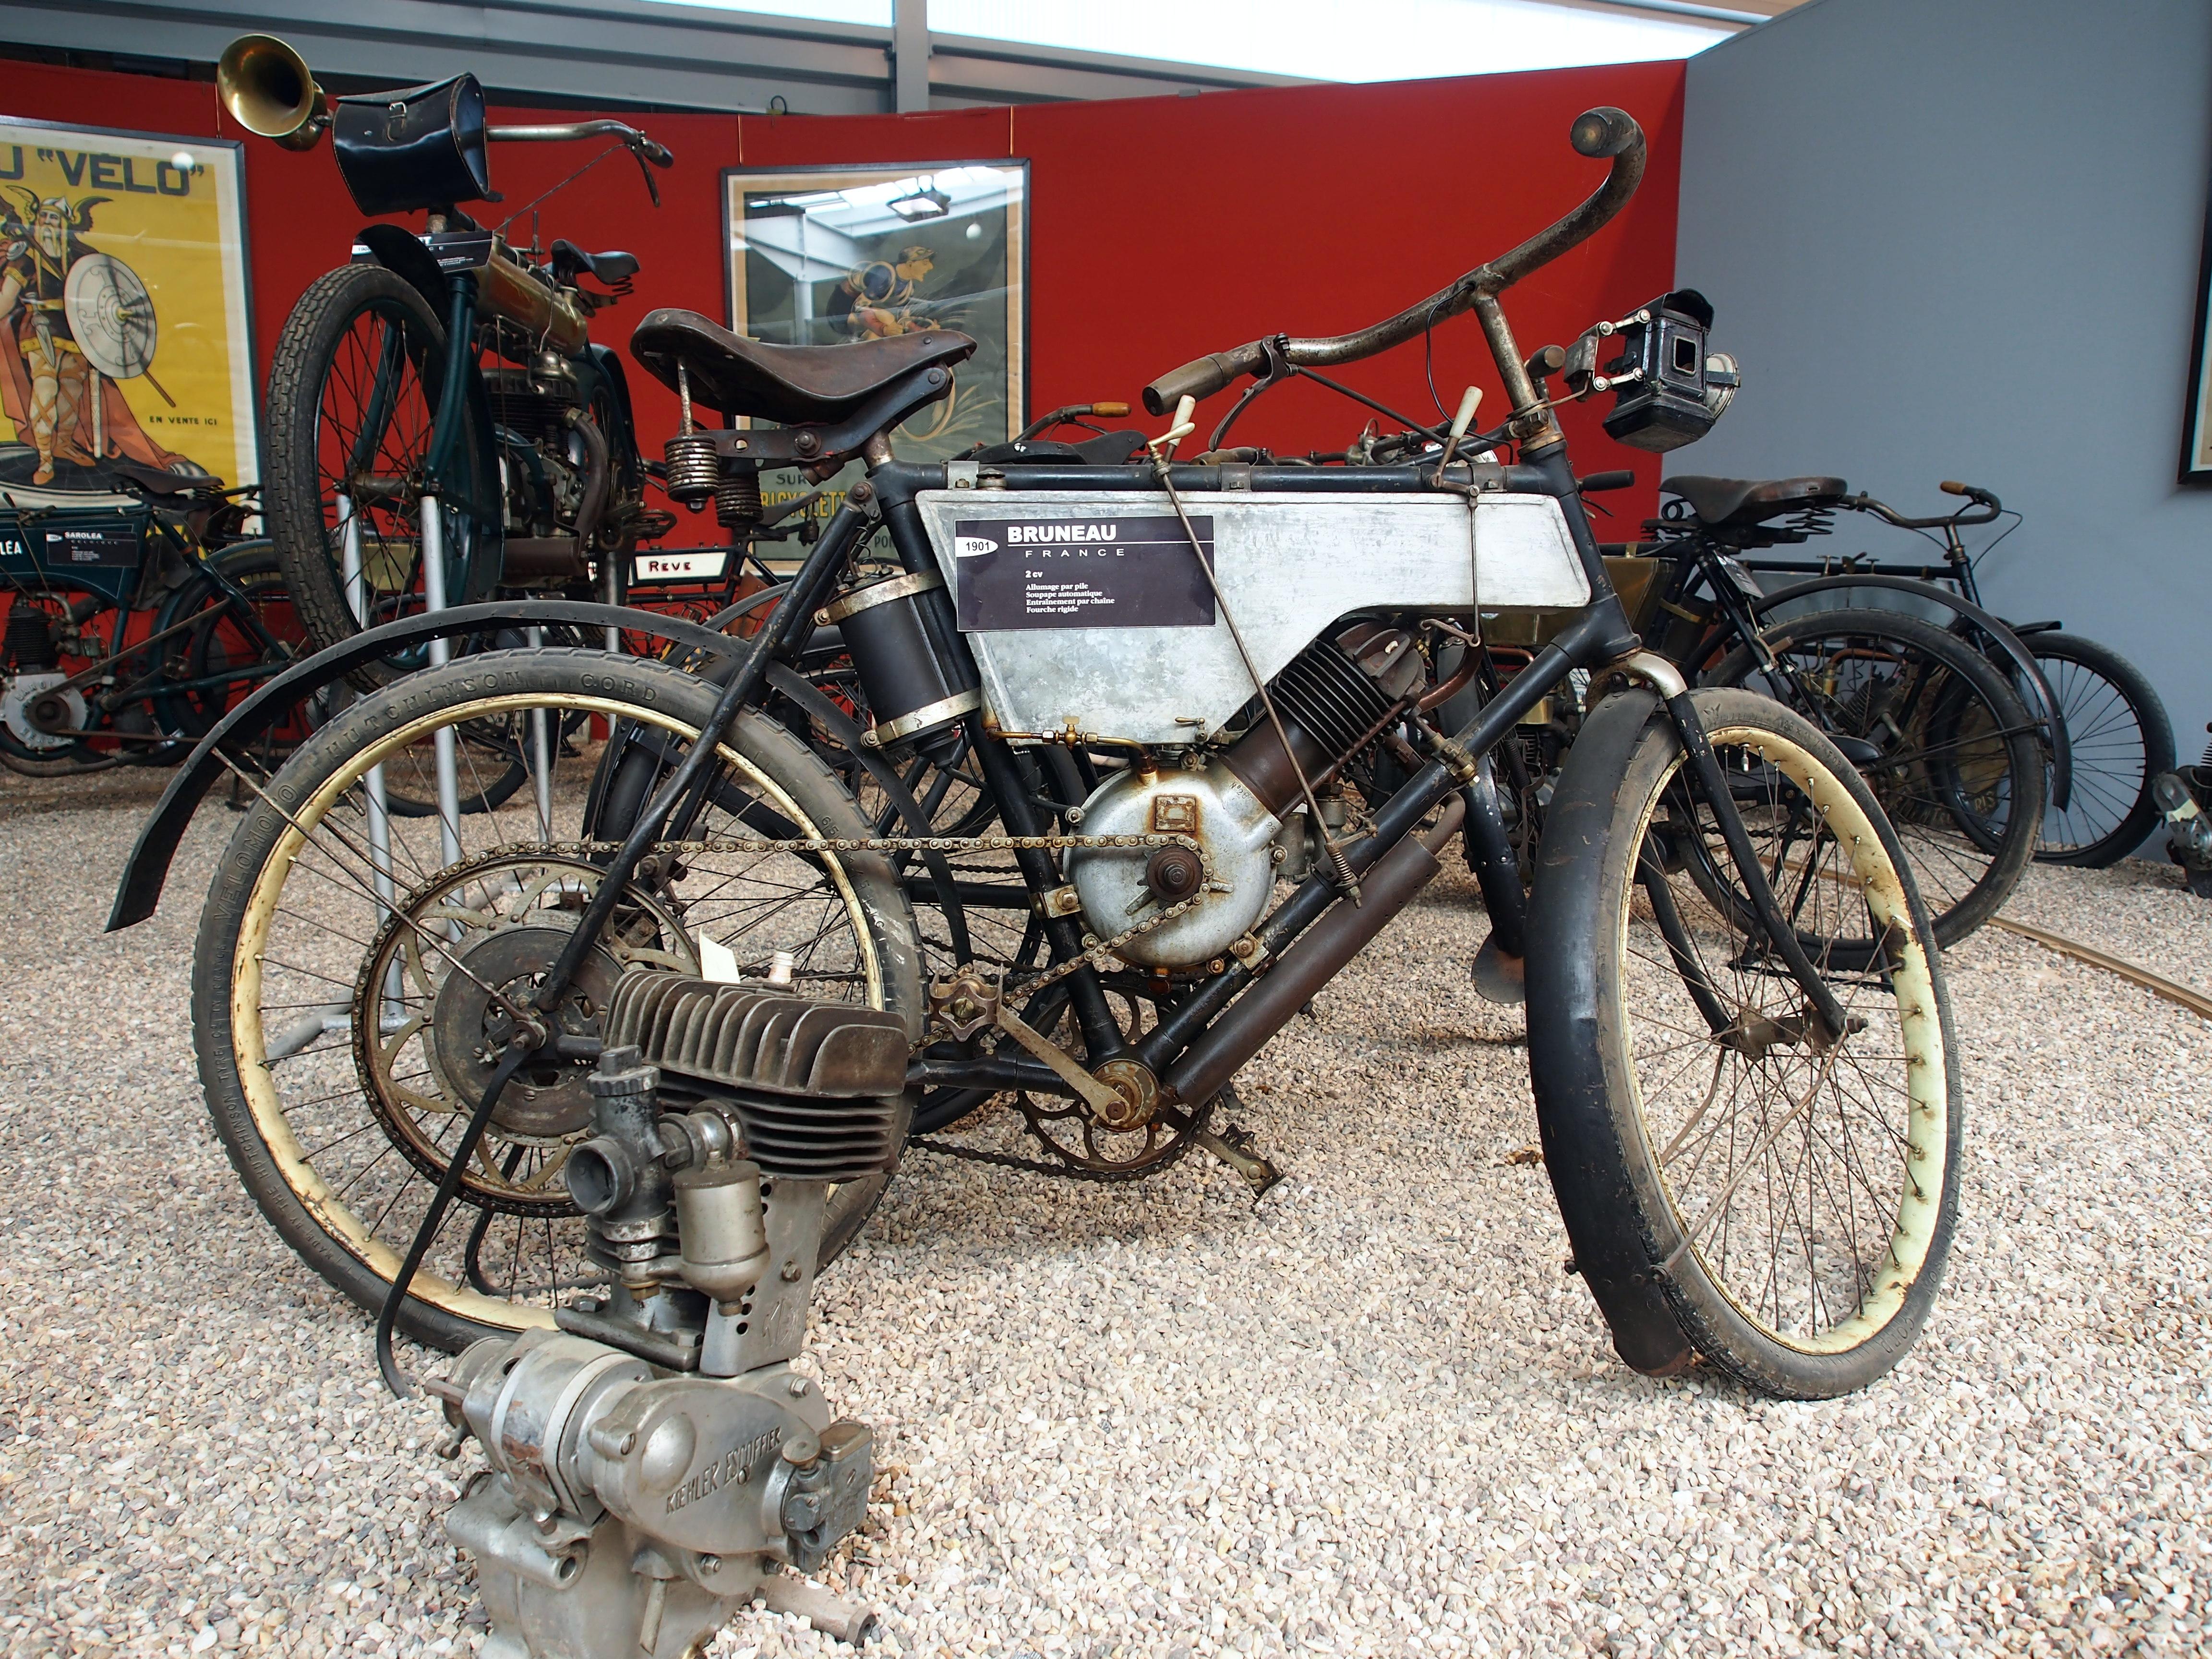 file 1901 bruneau 2cv  mus u00e9e de la moto et du v u00e9lo  amneville  france  pic-001 jpg